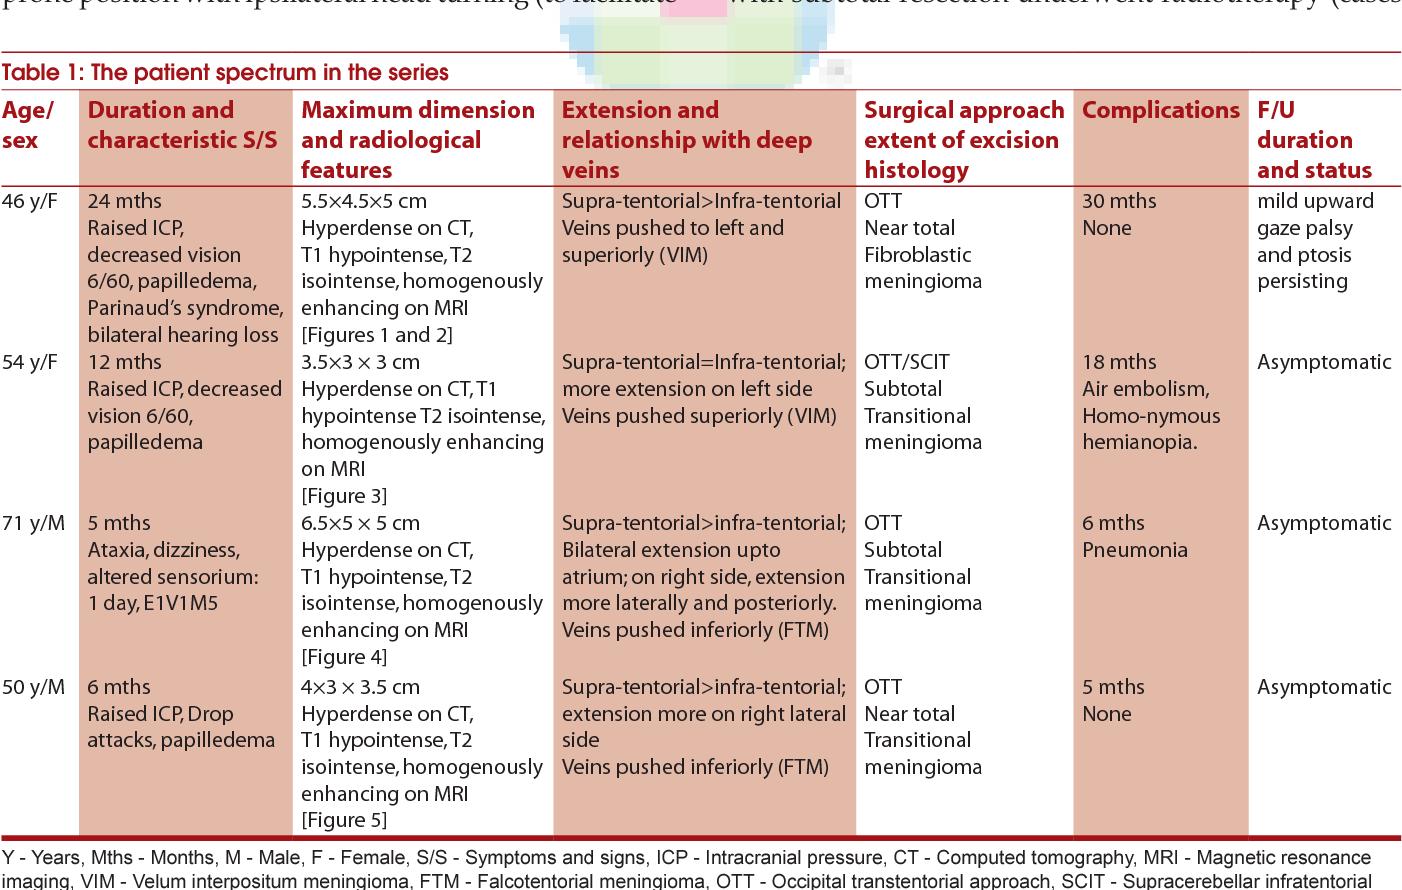 Large/giant meningiomas of posterior third ventricular region ...